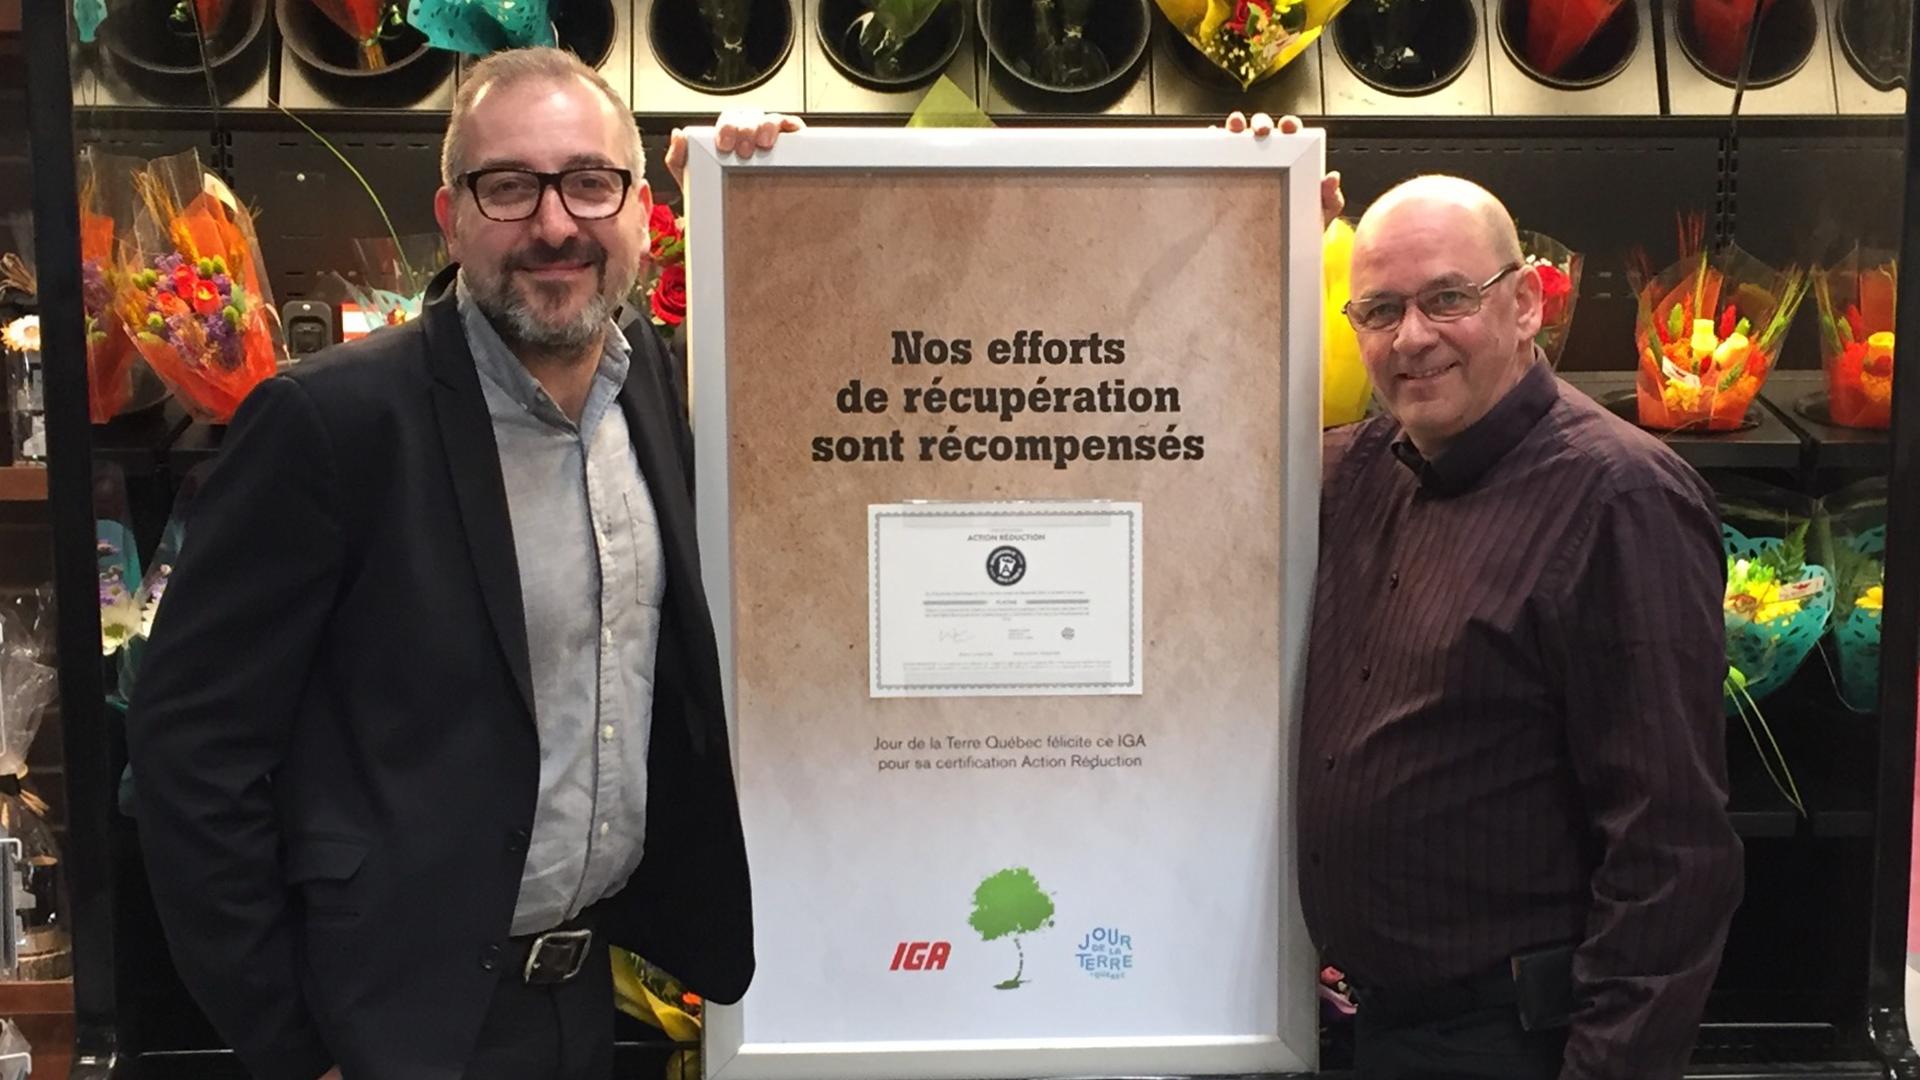 20170301_IGA_extra_Chouinard_Fils_Denis_Dupont_Action_Reduction_jour_de_la_terre_Quebec